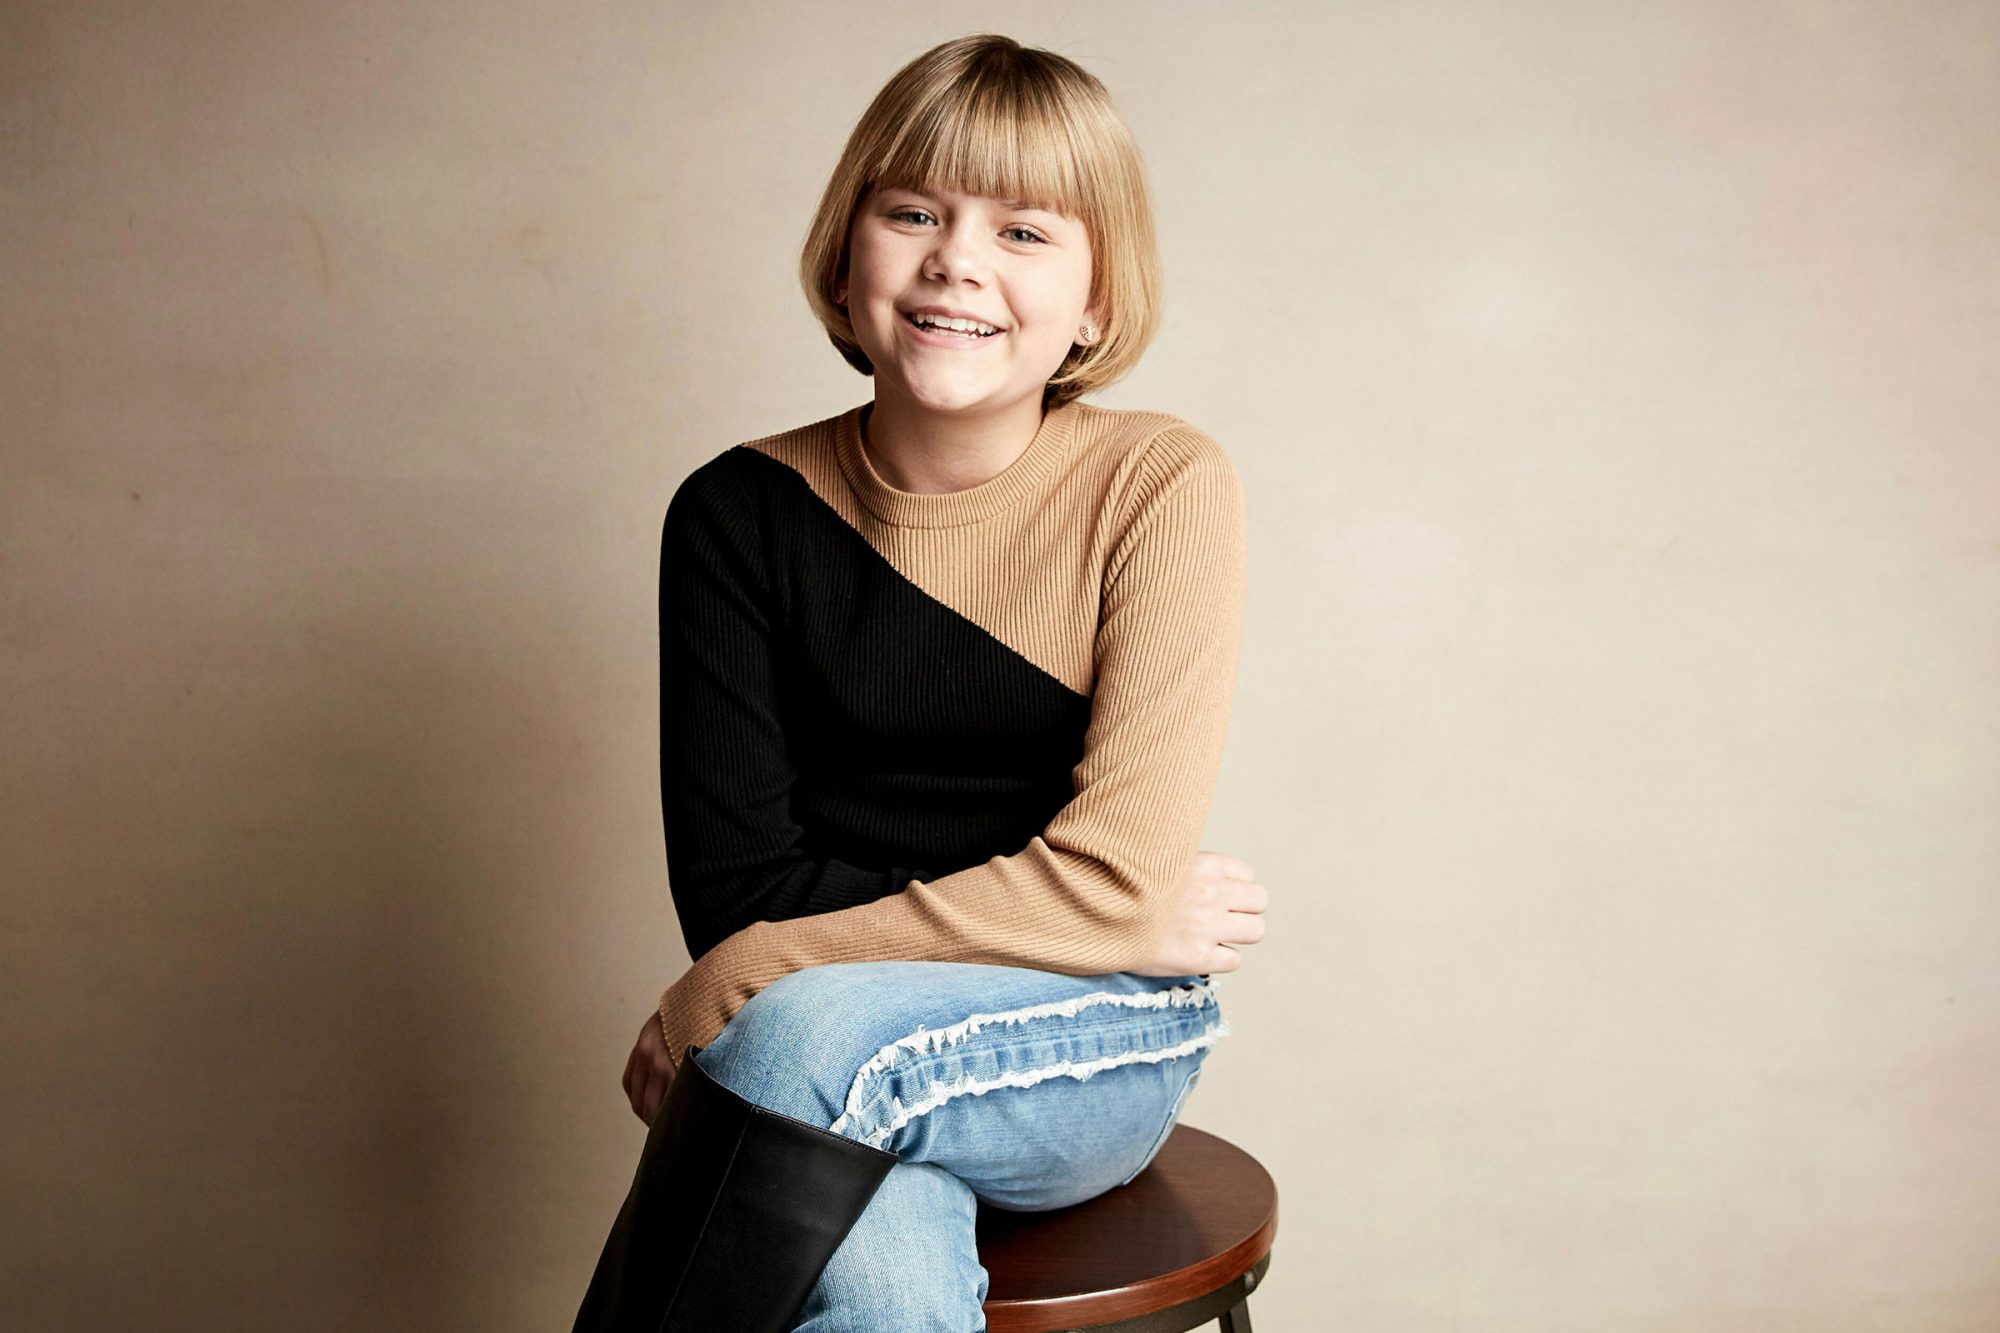 Lia McHugh